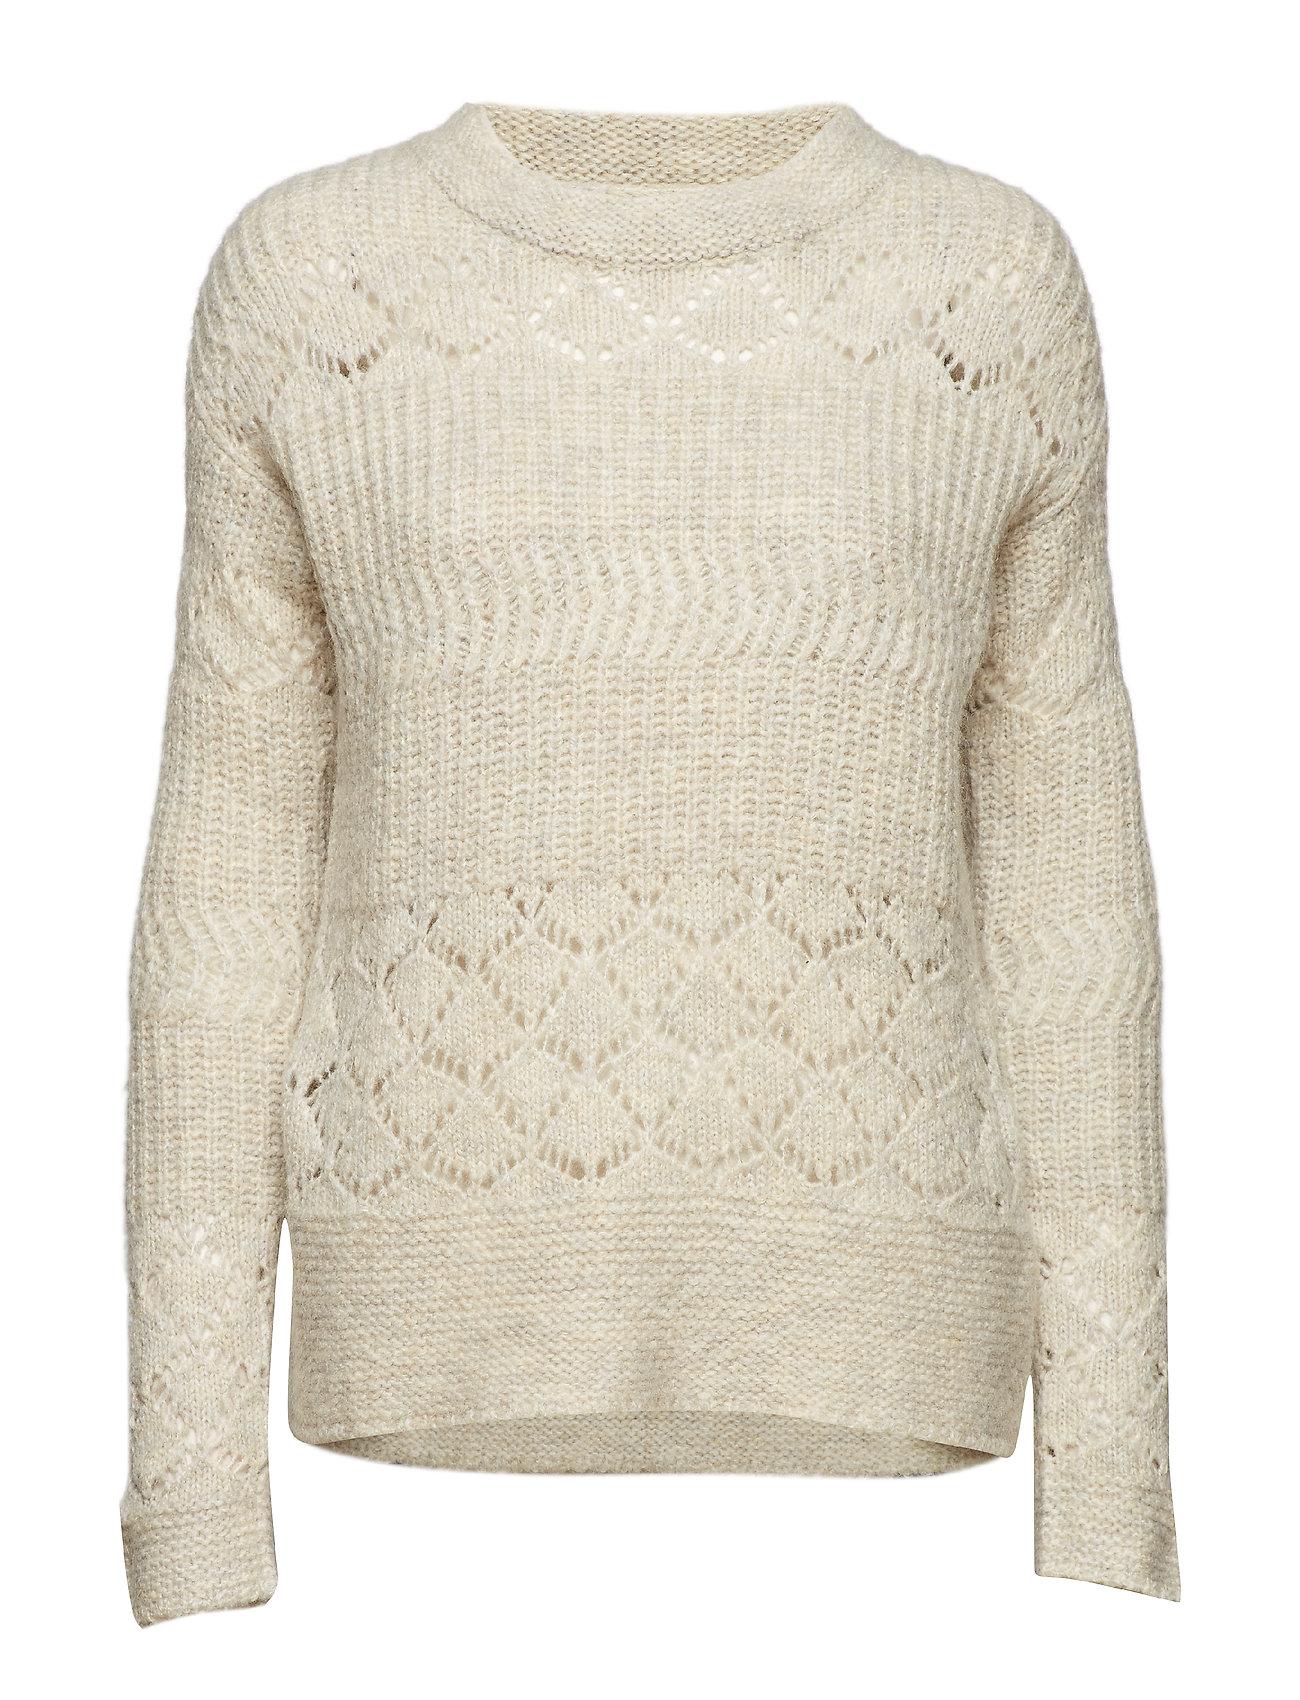 88b284804c Wolly Blocks Sweater (Chalk) (£99.50) - ODD MOLLY -